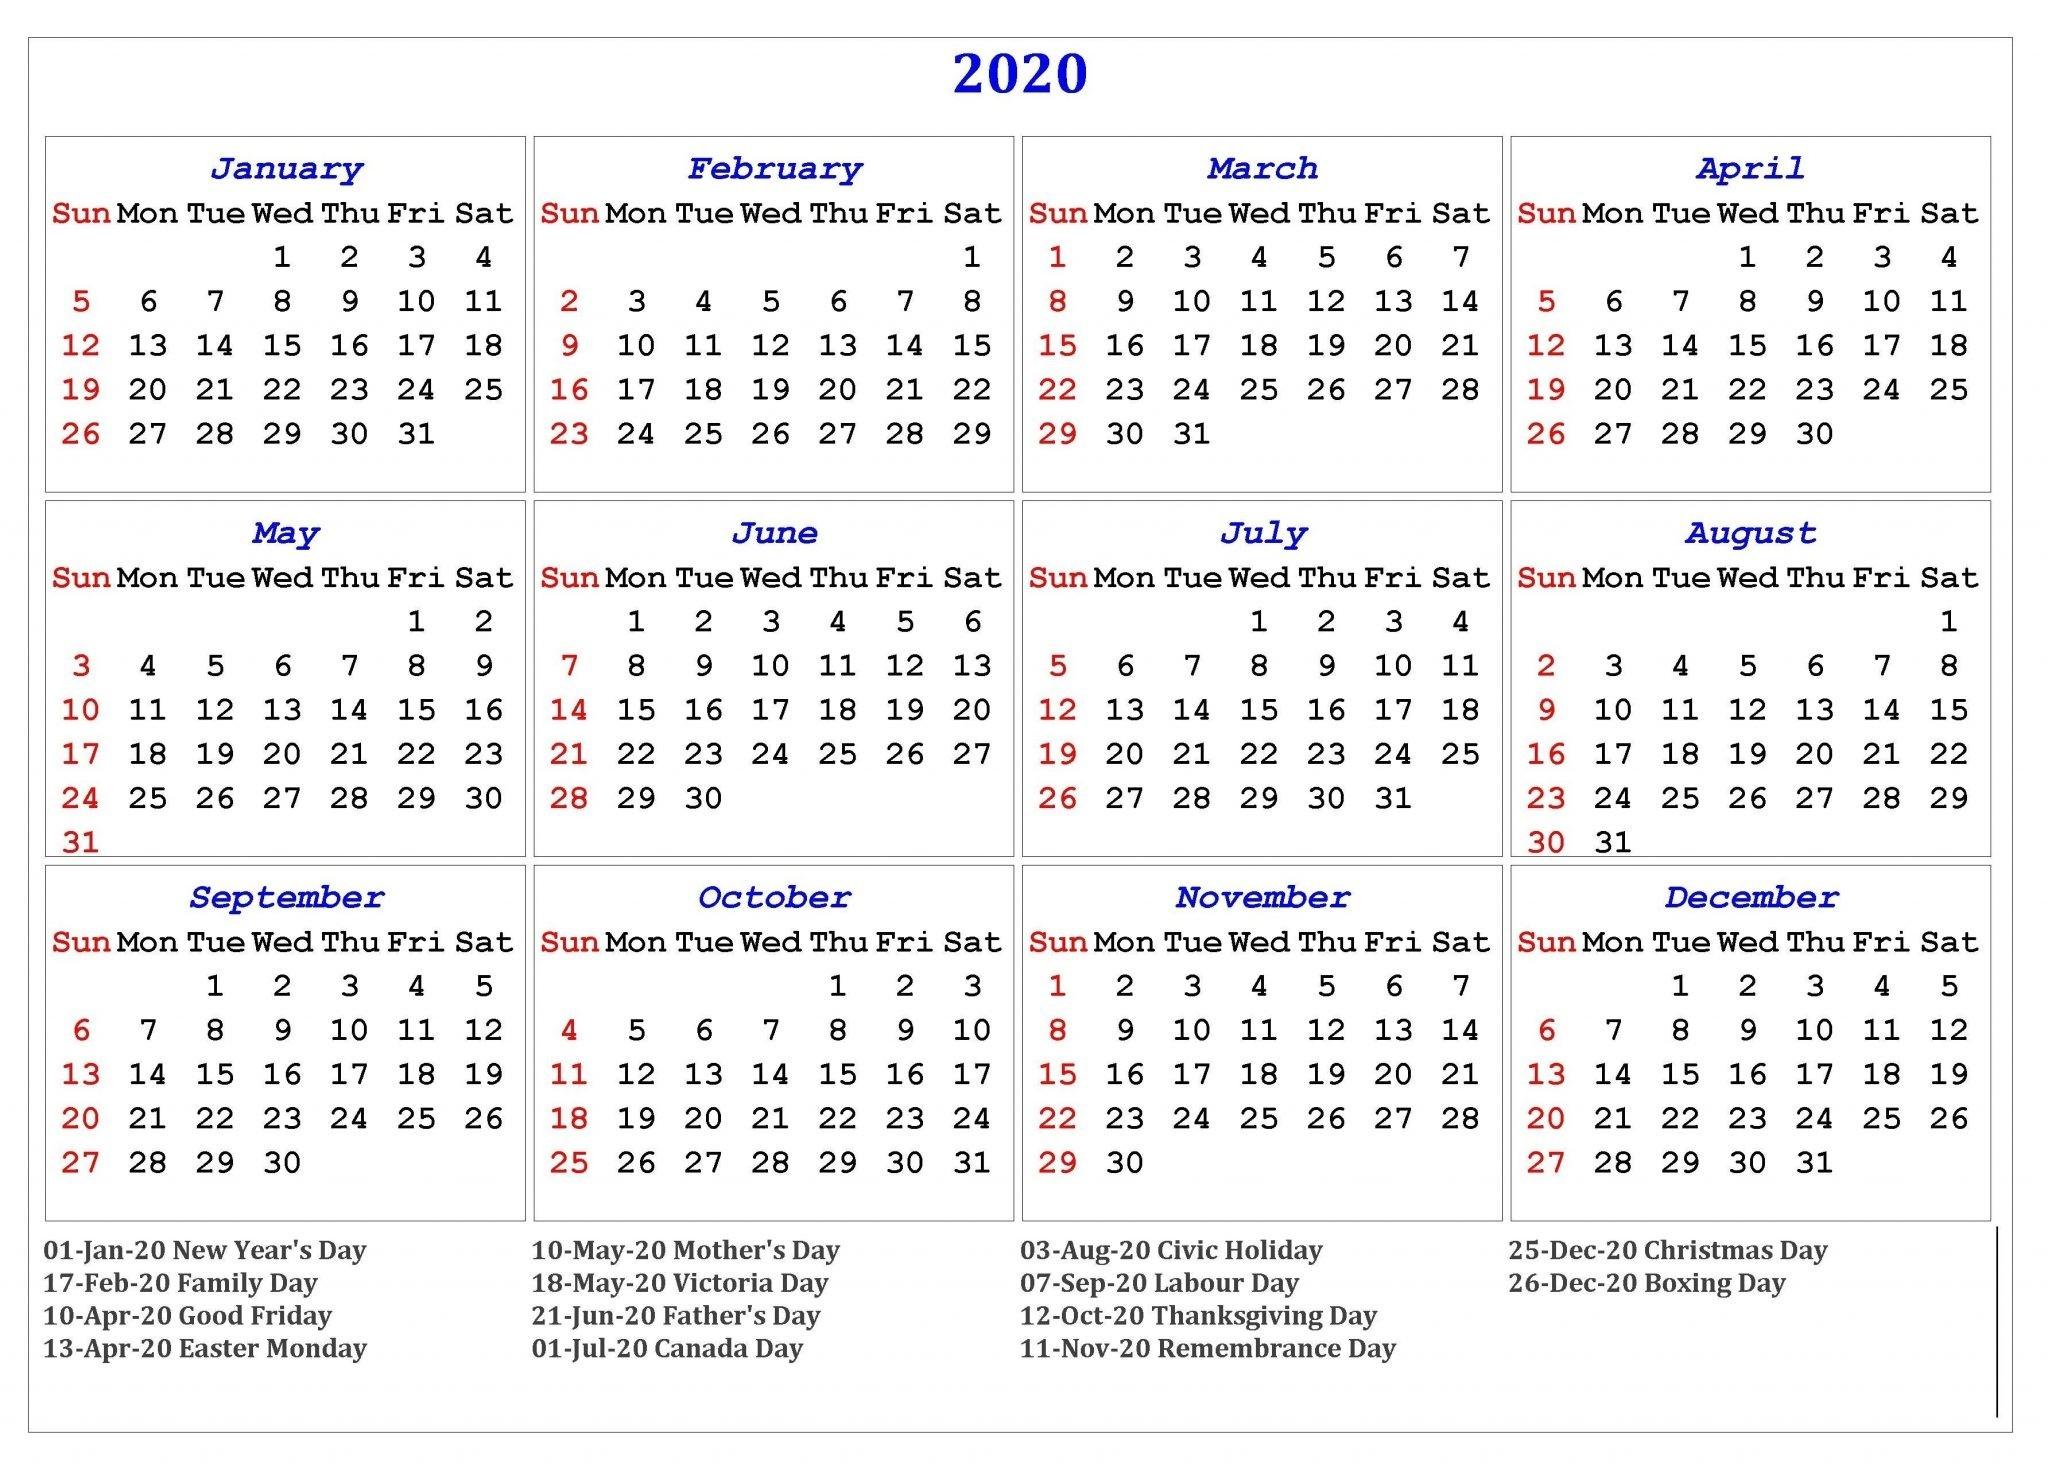 Free Yearly Printable Calendar 2020 With Holidays-Printable 2020 Holidays India